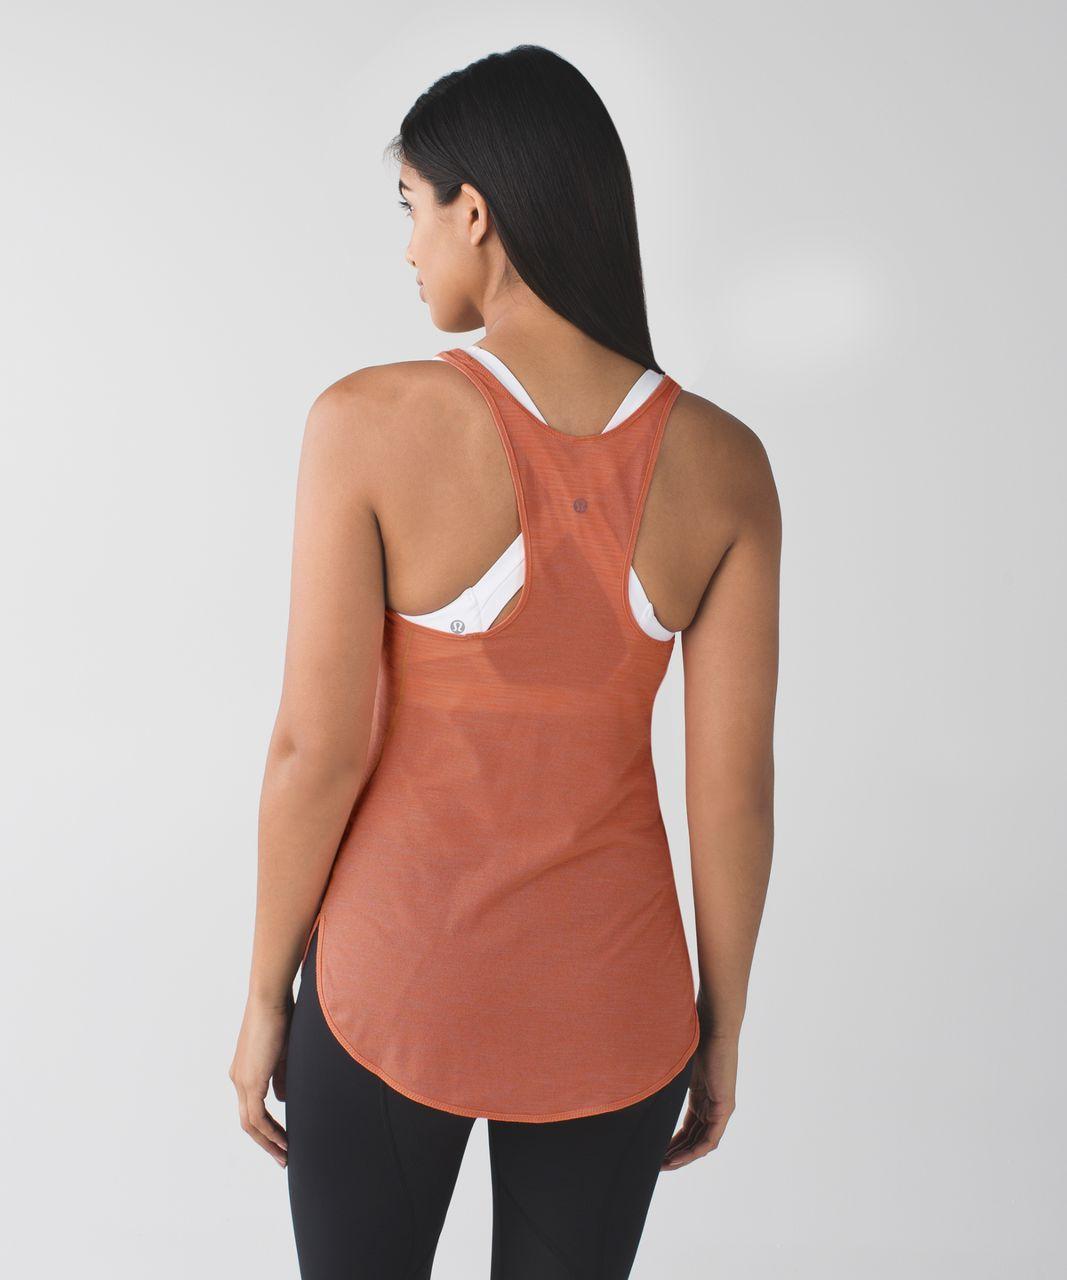 Lululemon What The Sport Singlet - Heathered Plum Peach